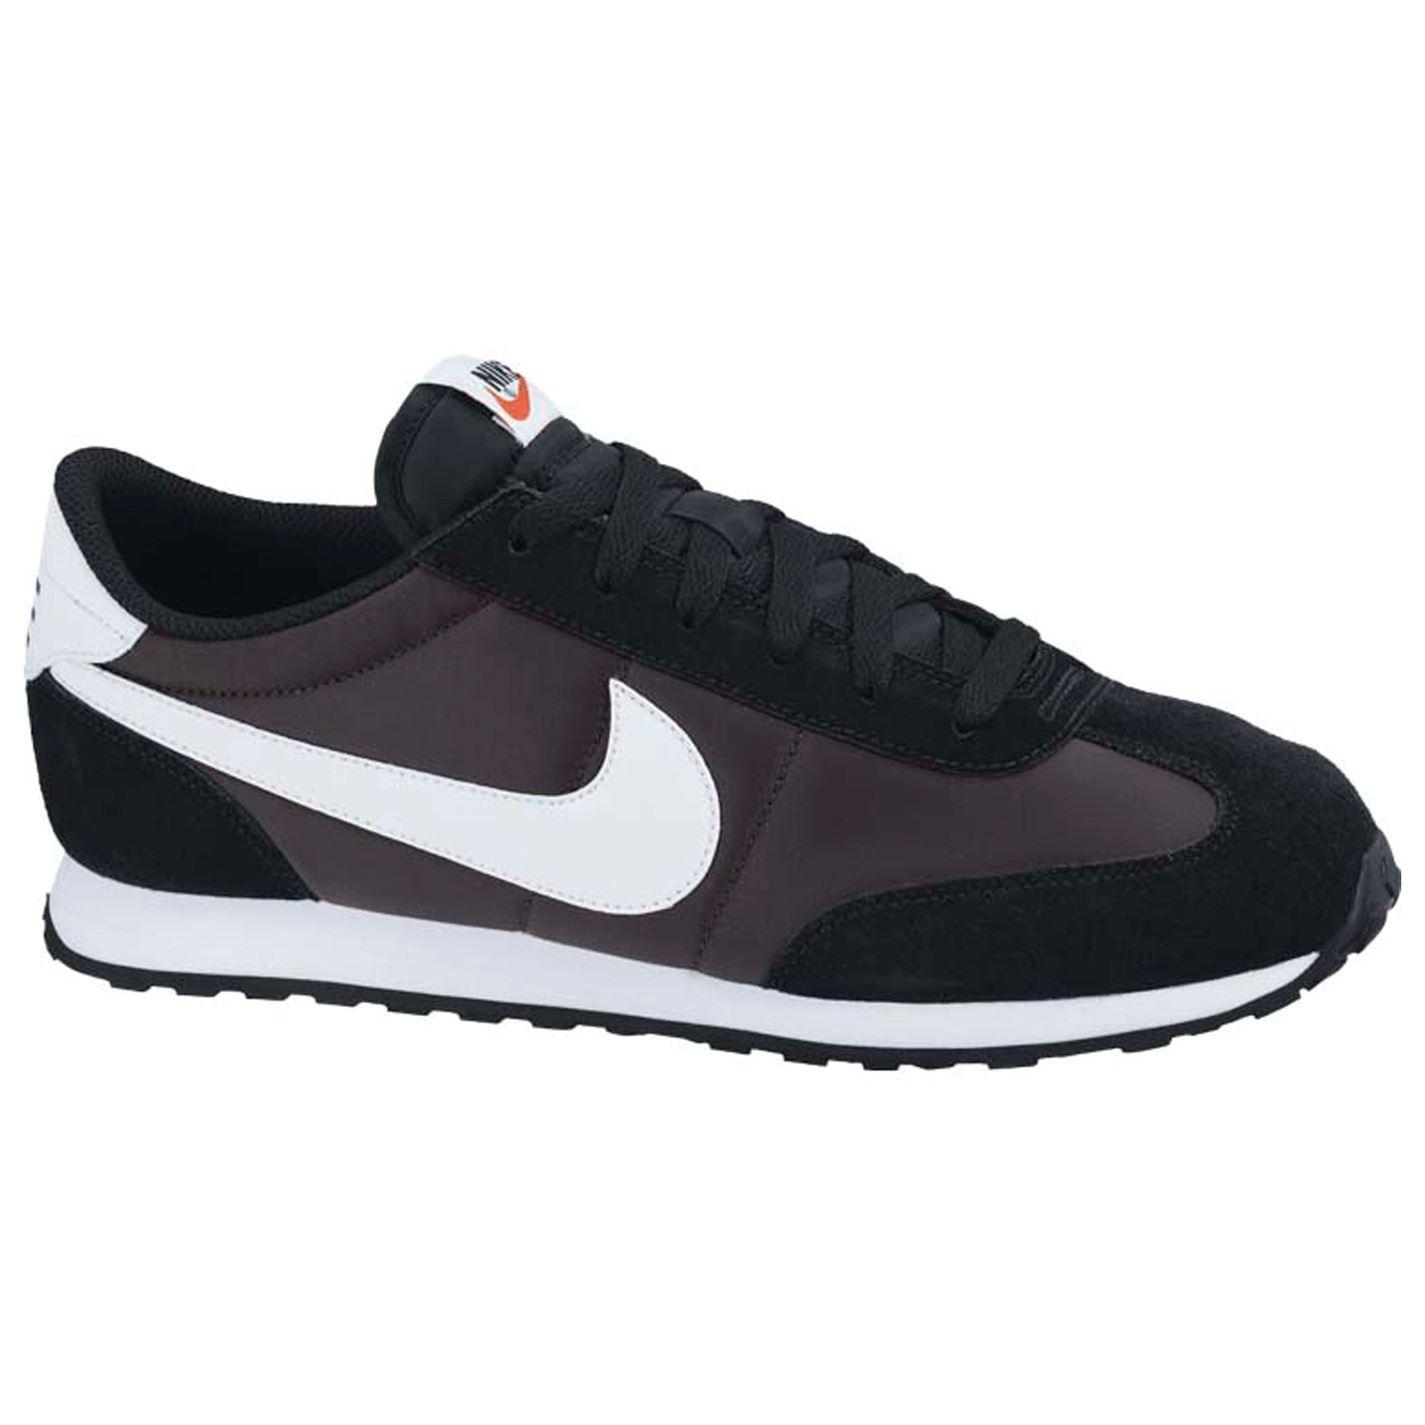 Heren Details Mach Nike Athleisure Sneakers trainers schoenen Runner over qr1Bxra